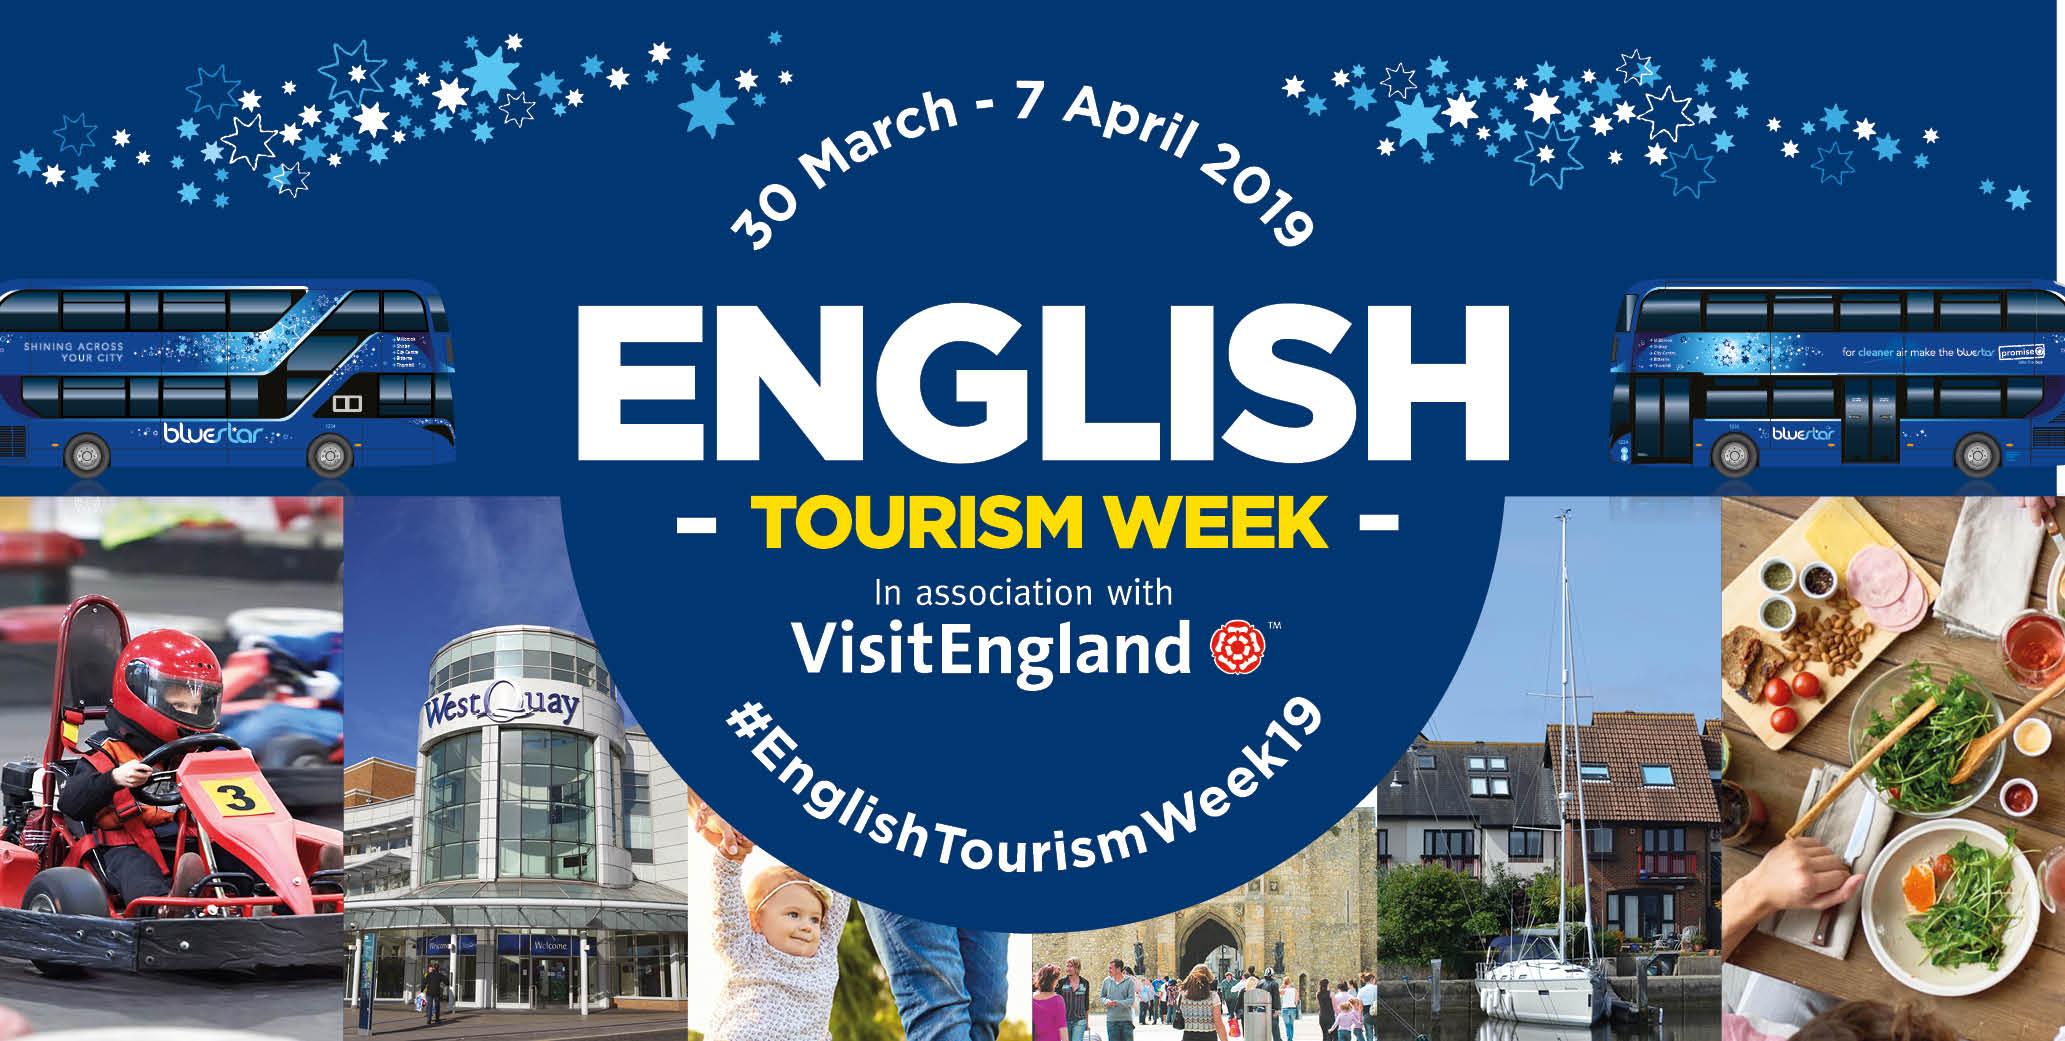 English tourism week - 30th March - 7th April.